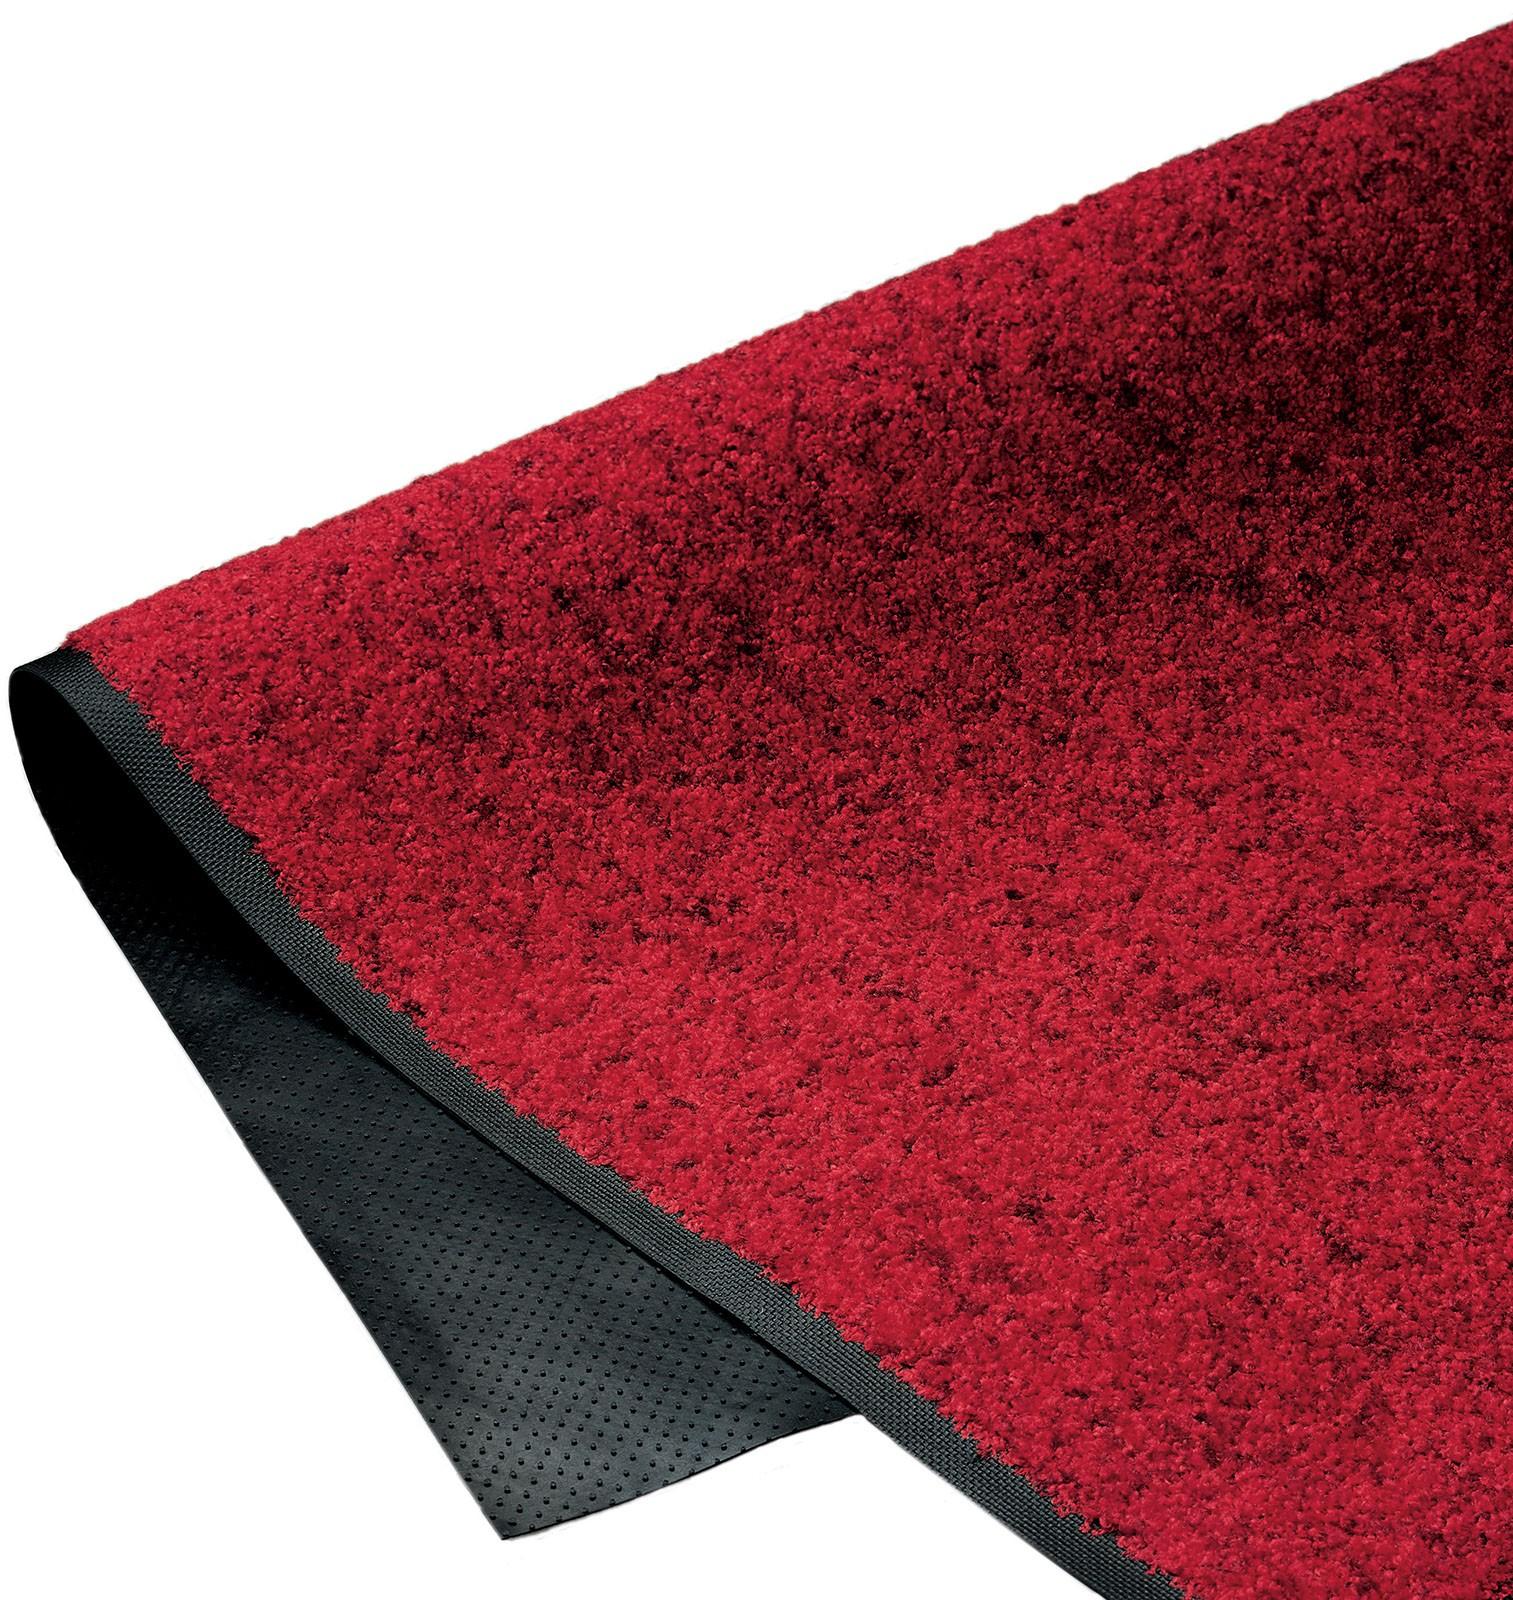 Industrial Floor Mats: DURAMAT Indoor Carpet Entrance Floor Mat